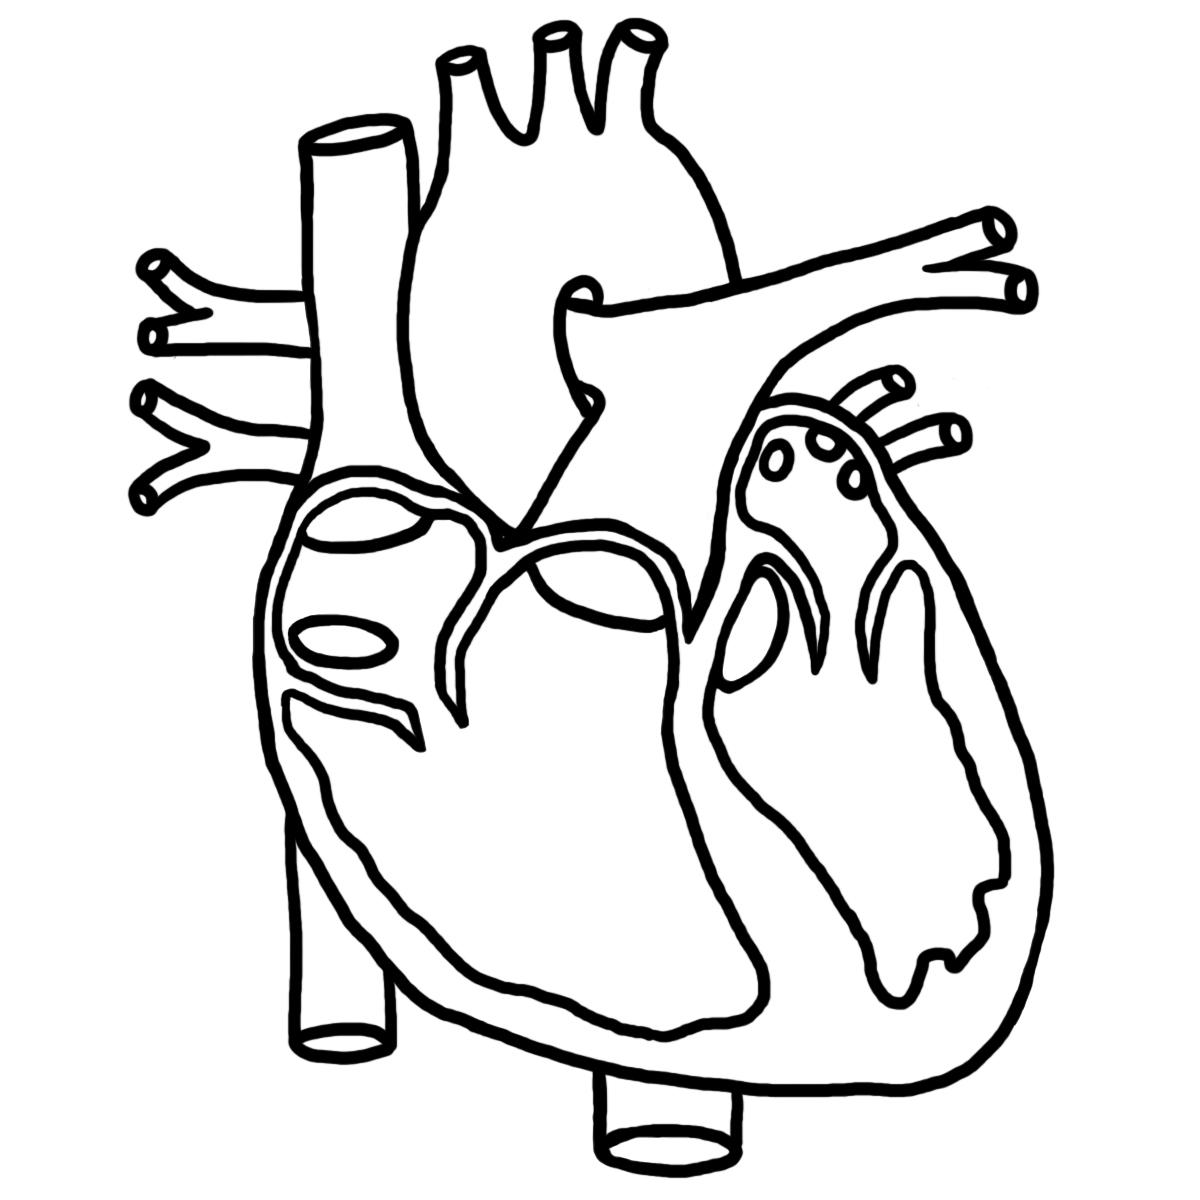 1200x1200 Diagram 3d Heart Diagram Cross Section